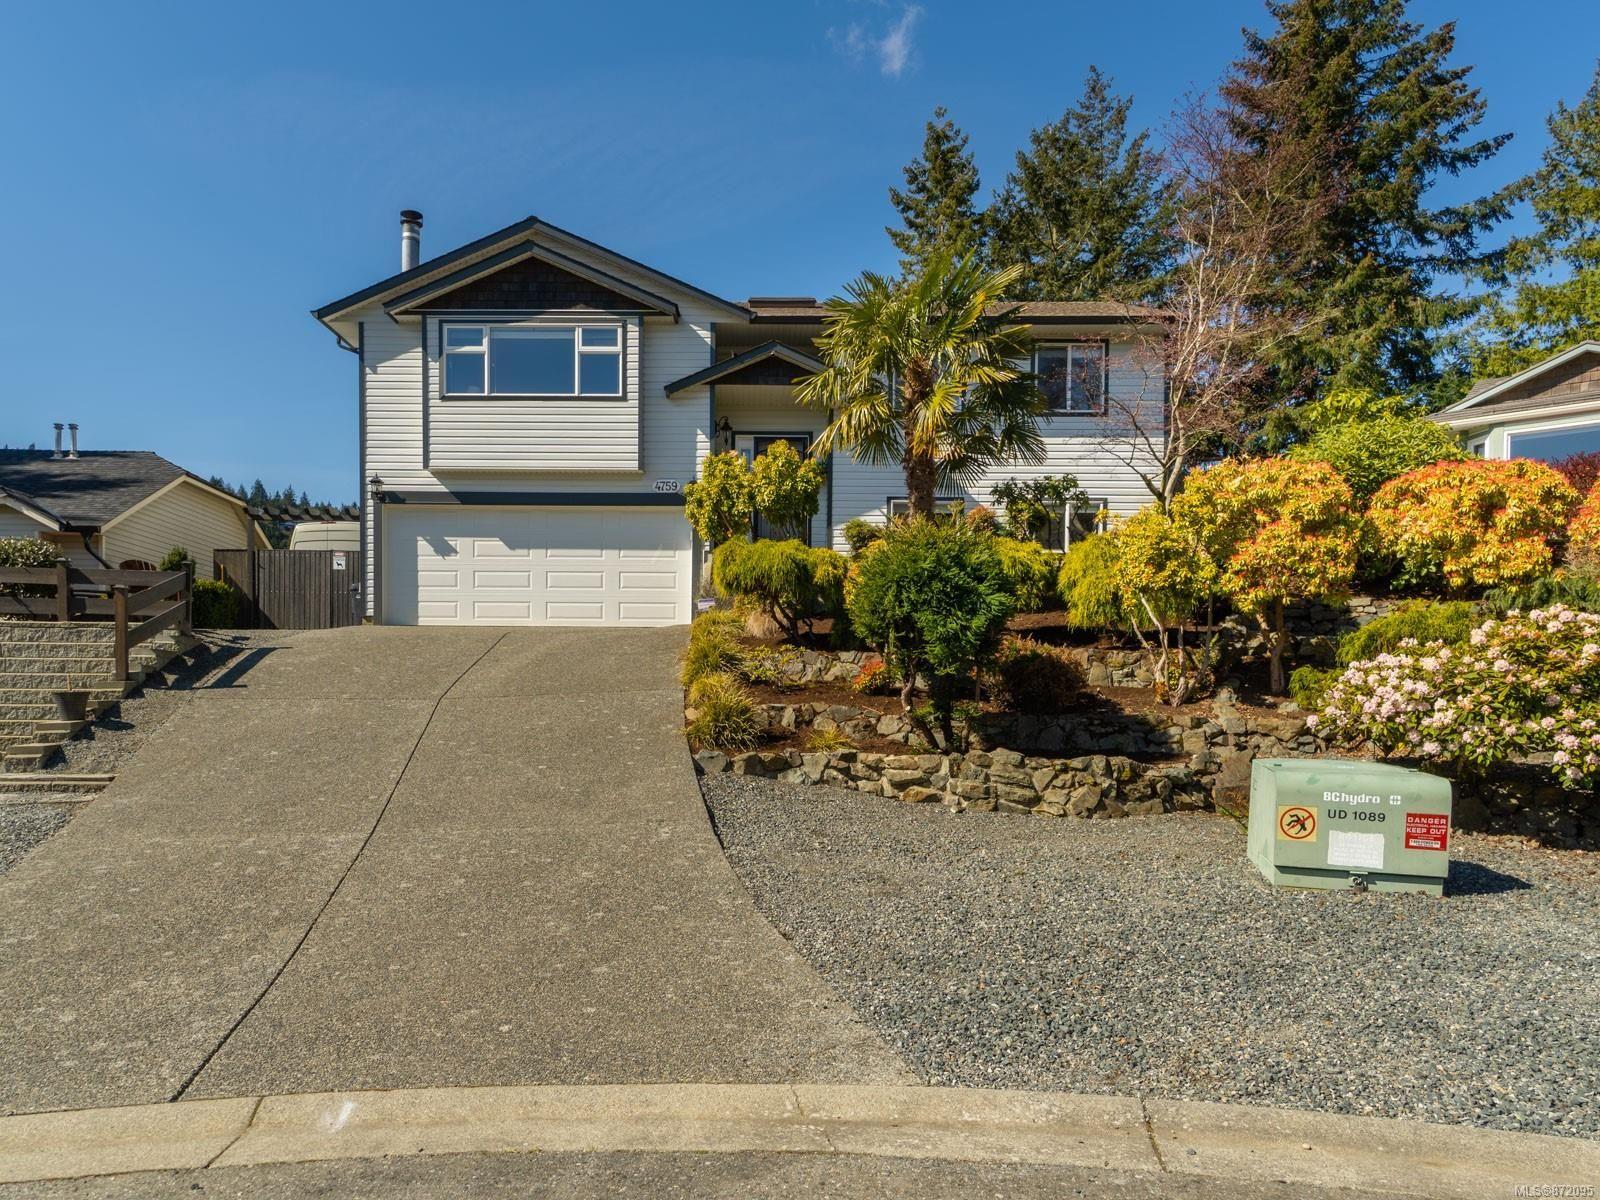 Main Photo: 4759 Spirit Pl in : Na North Nanaimo House for sale (Nanaimo)  : MLS®# 872095